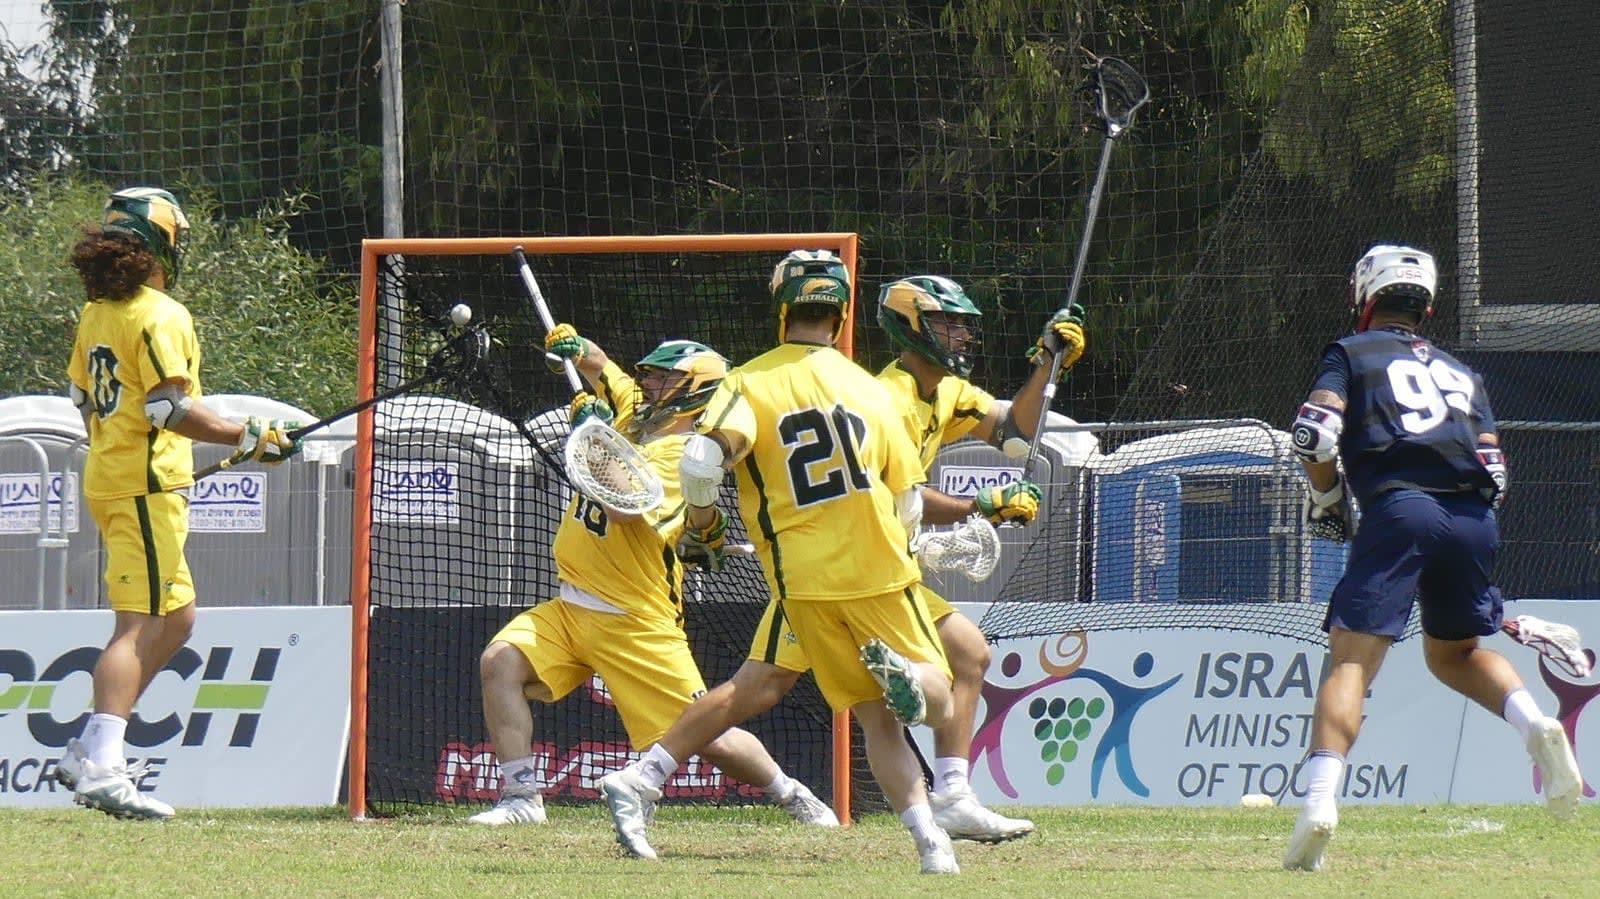 USA Australia 2018 World Lacrosse Championships Roger Davis top photos blue group